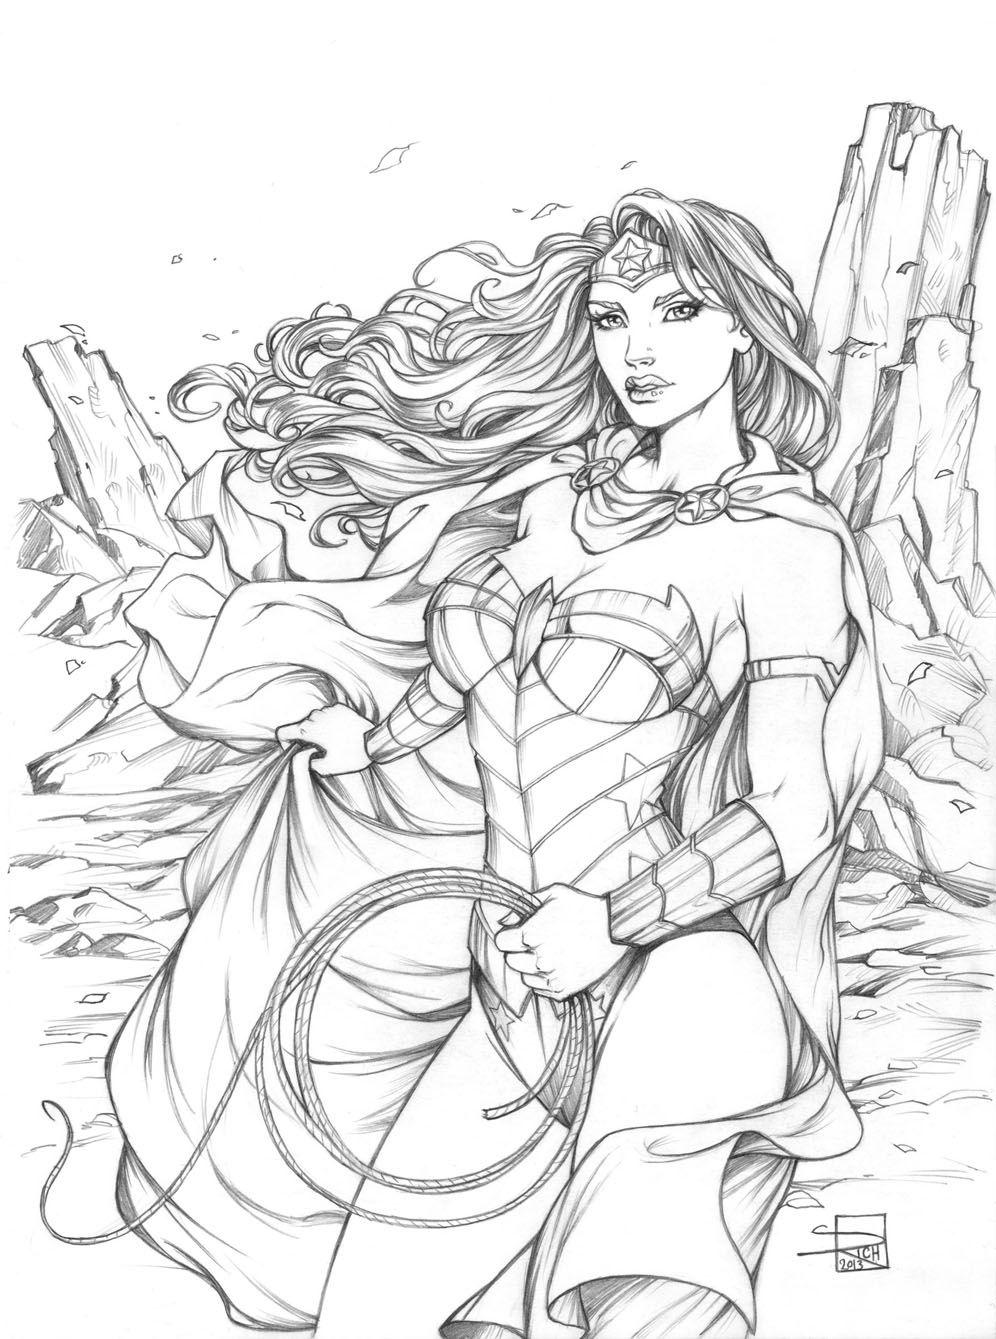 Coloring pages wonder woman - Wonder Woman Pencils Comic Colouring Page